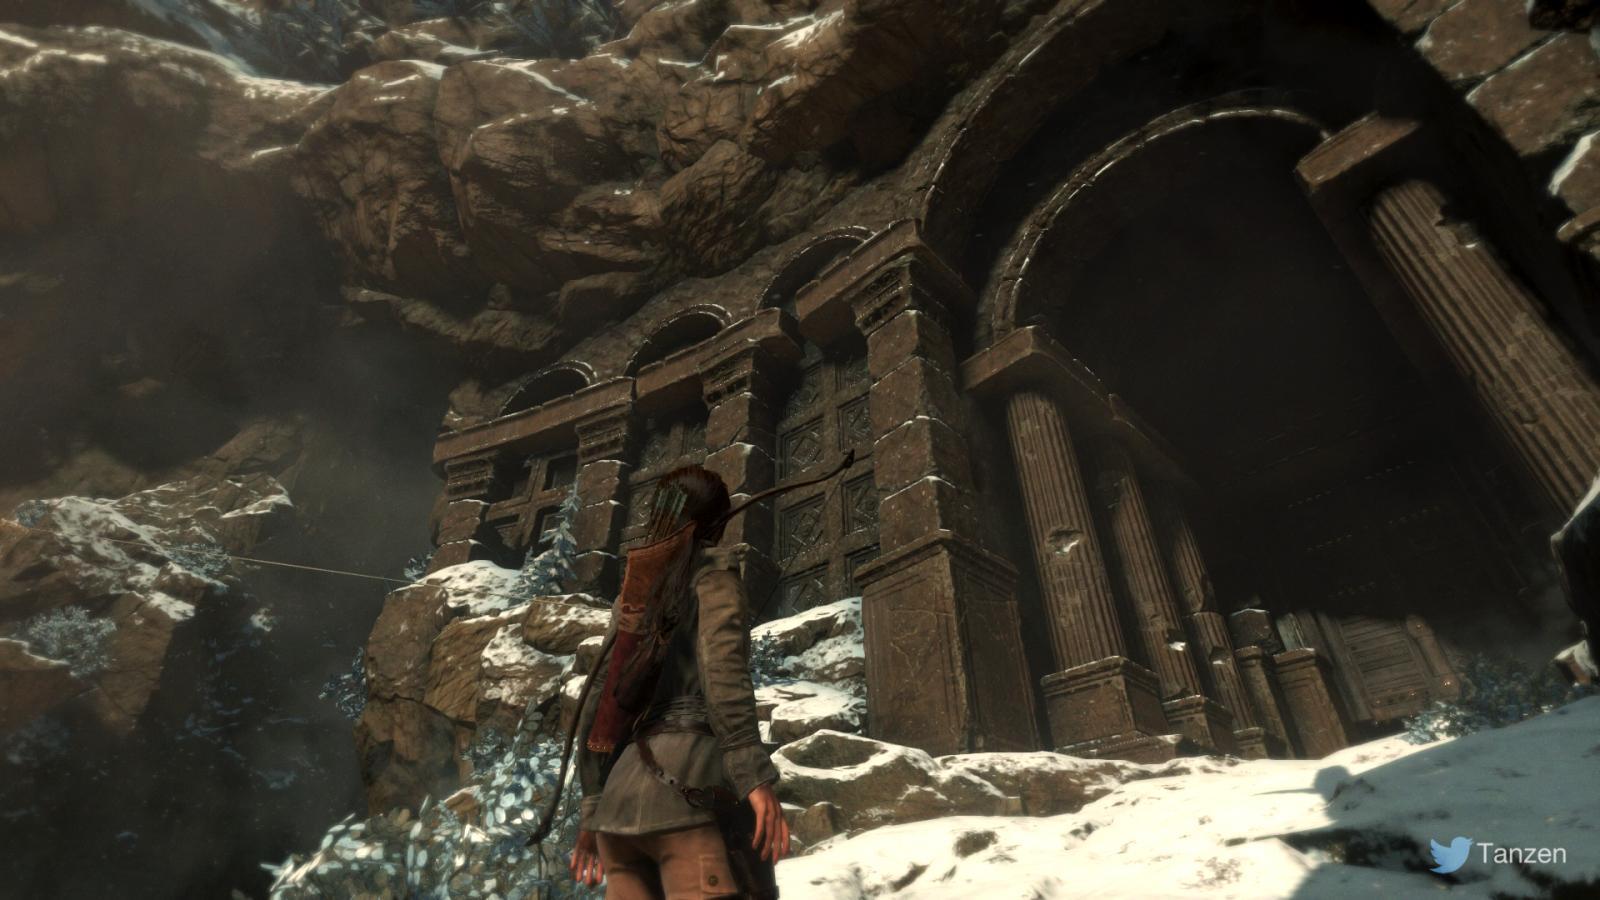 Rise of the Tomb Raider Screen Shot 09.11.15 20. 11_watermark